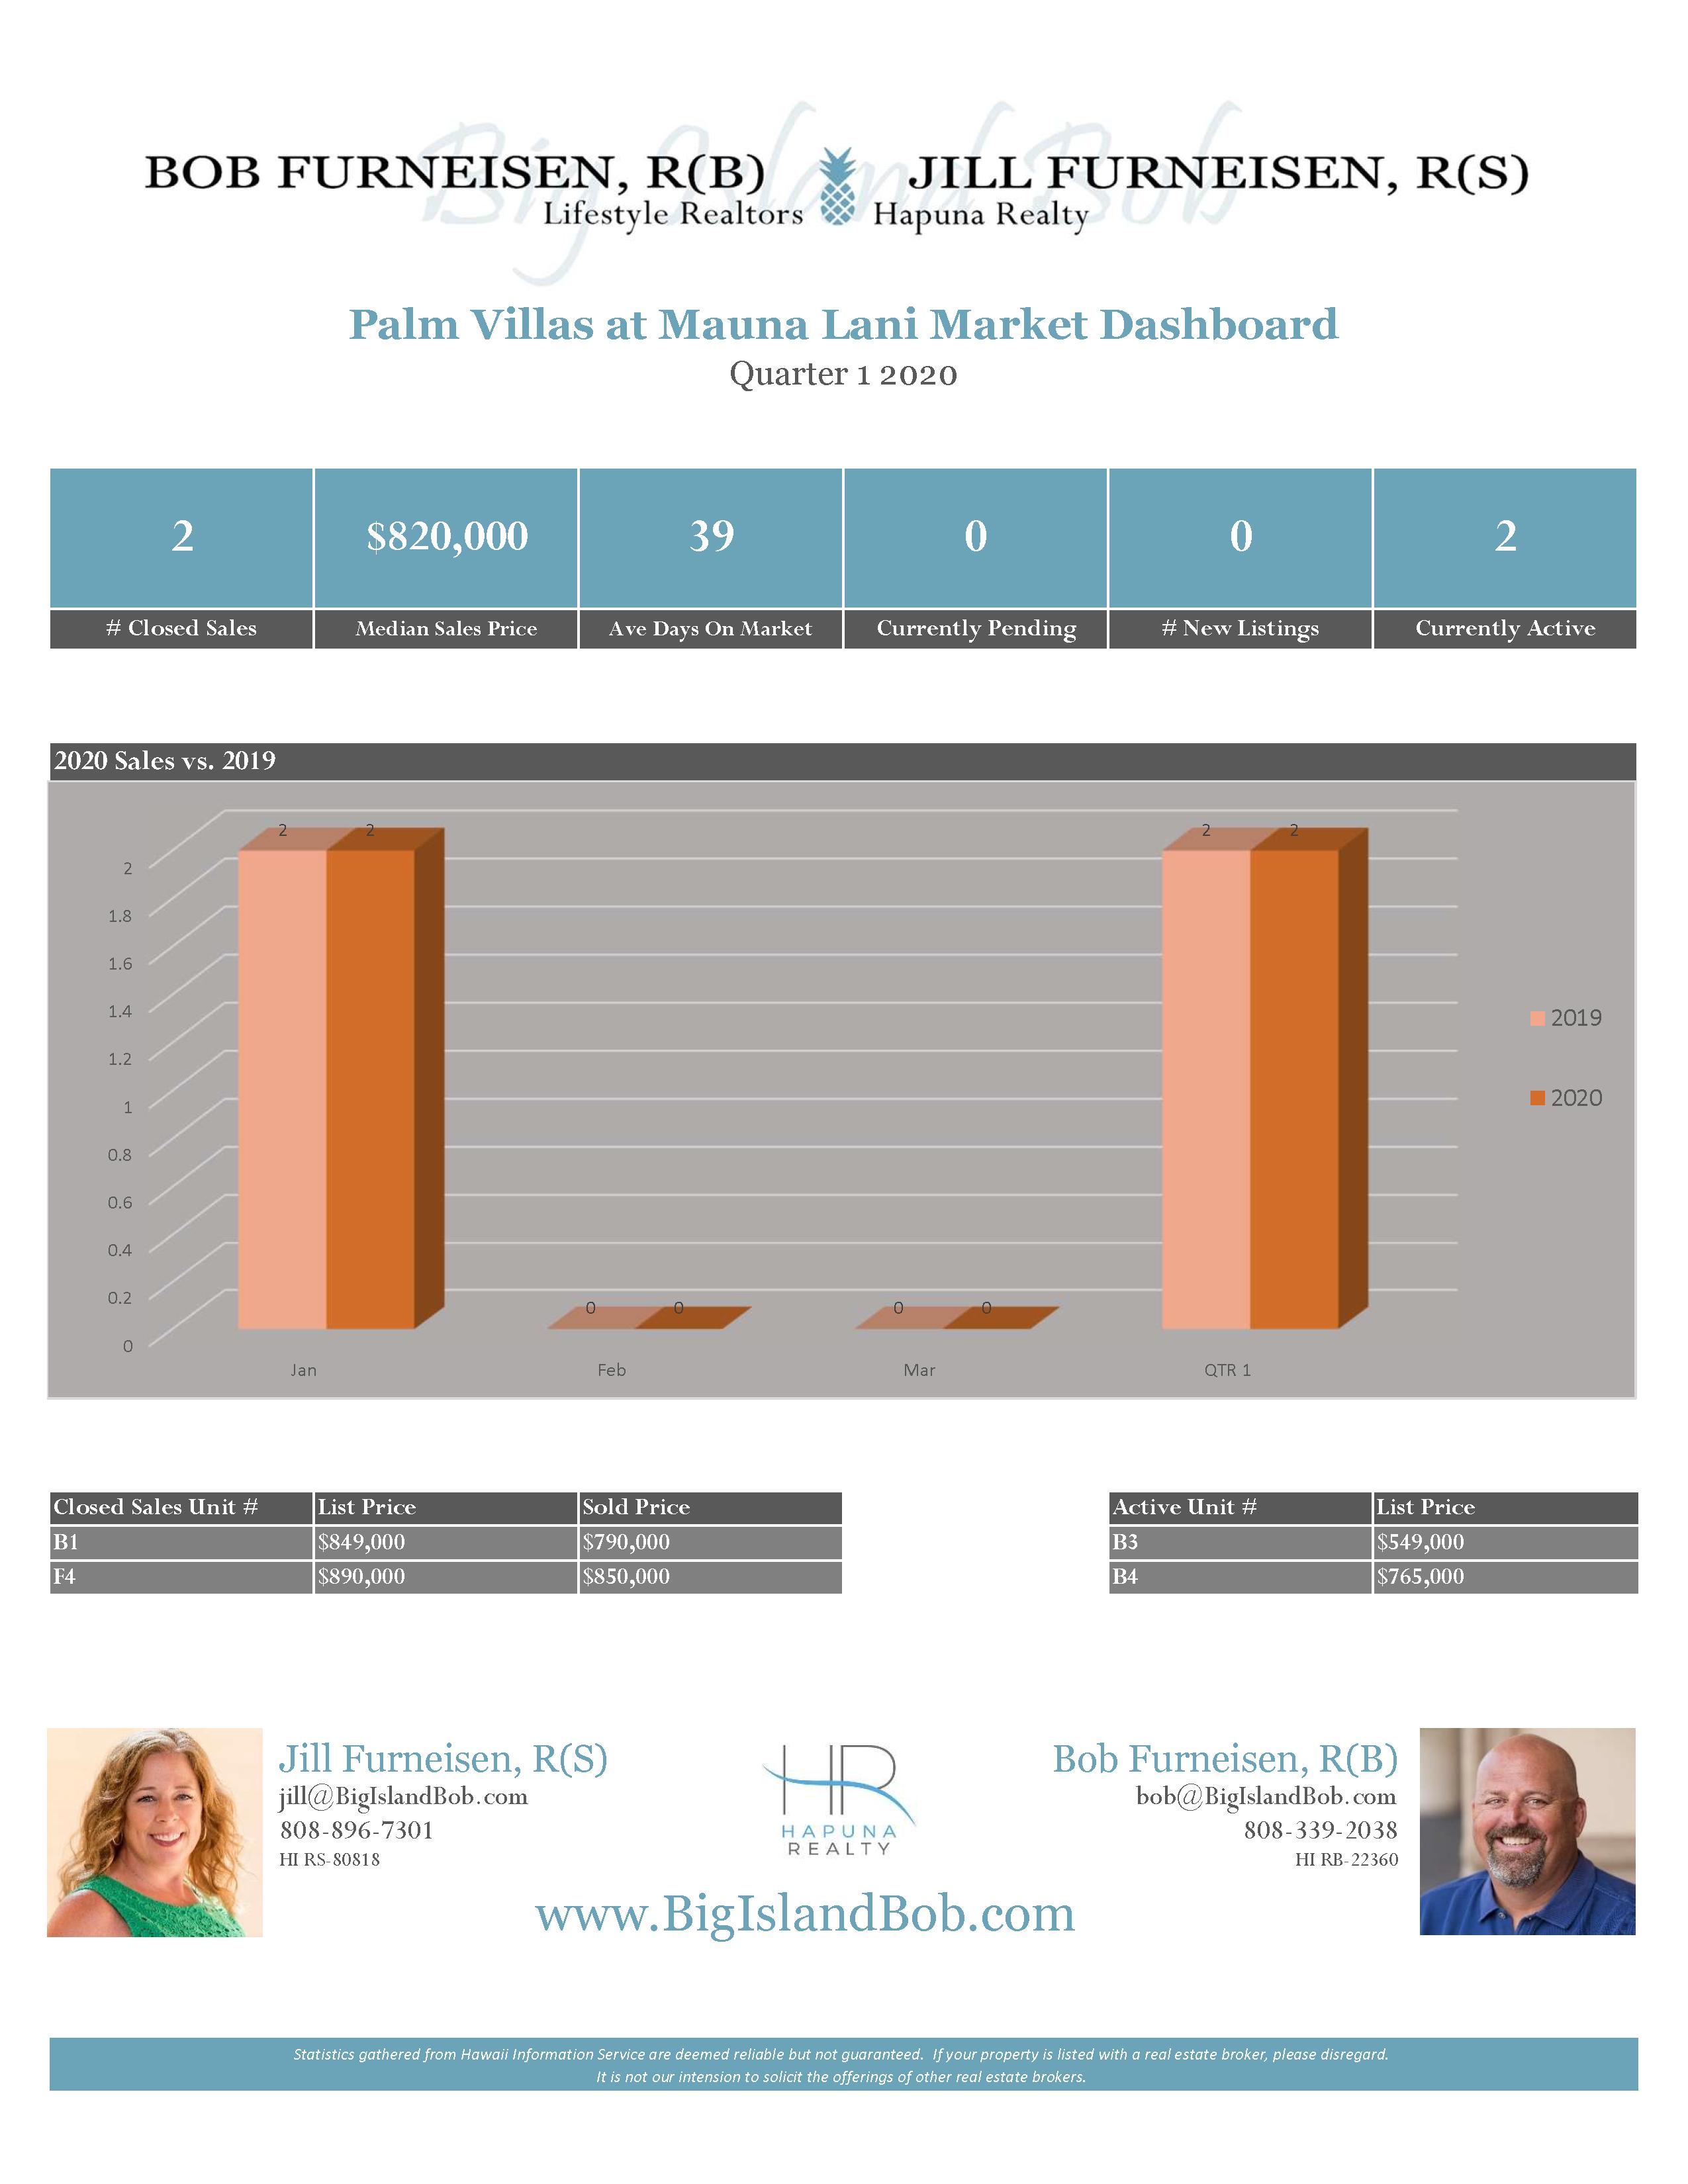 Palm Villas at Mauna Lani Quarter 1 2020 Real Estate Market Dashboard